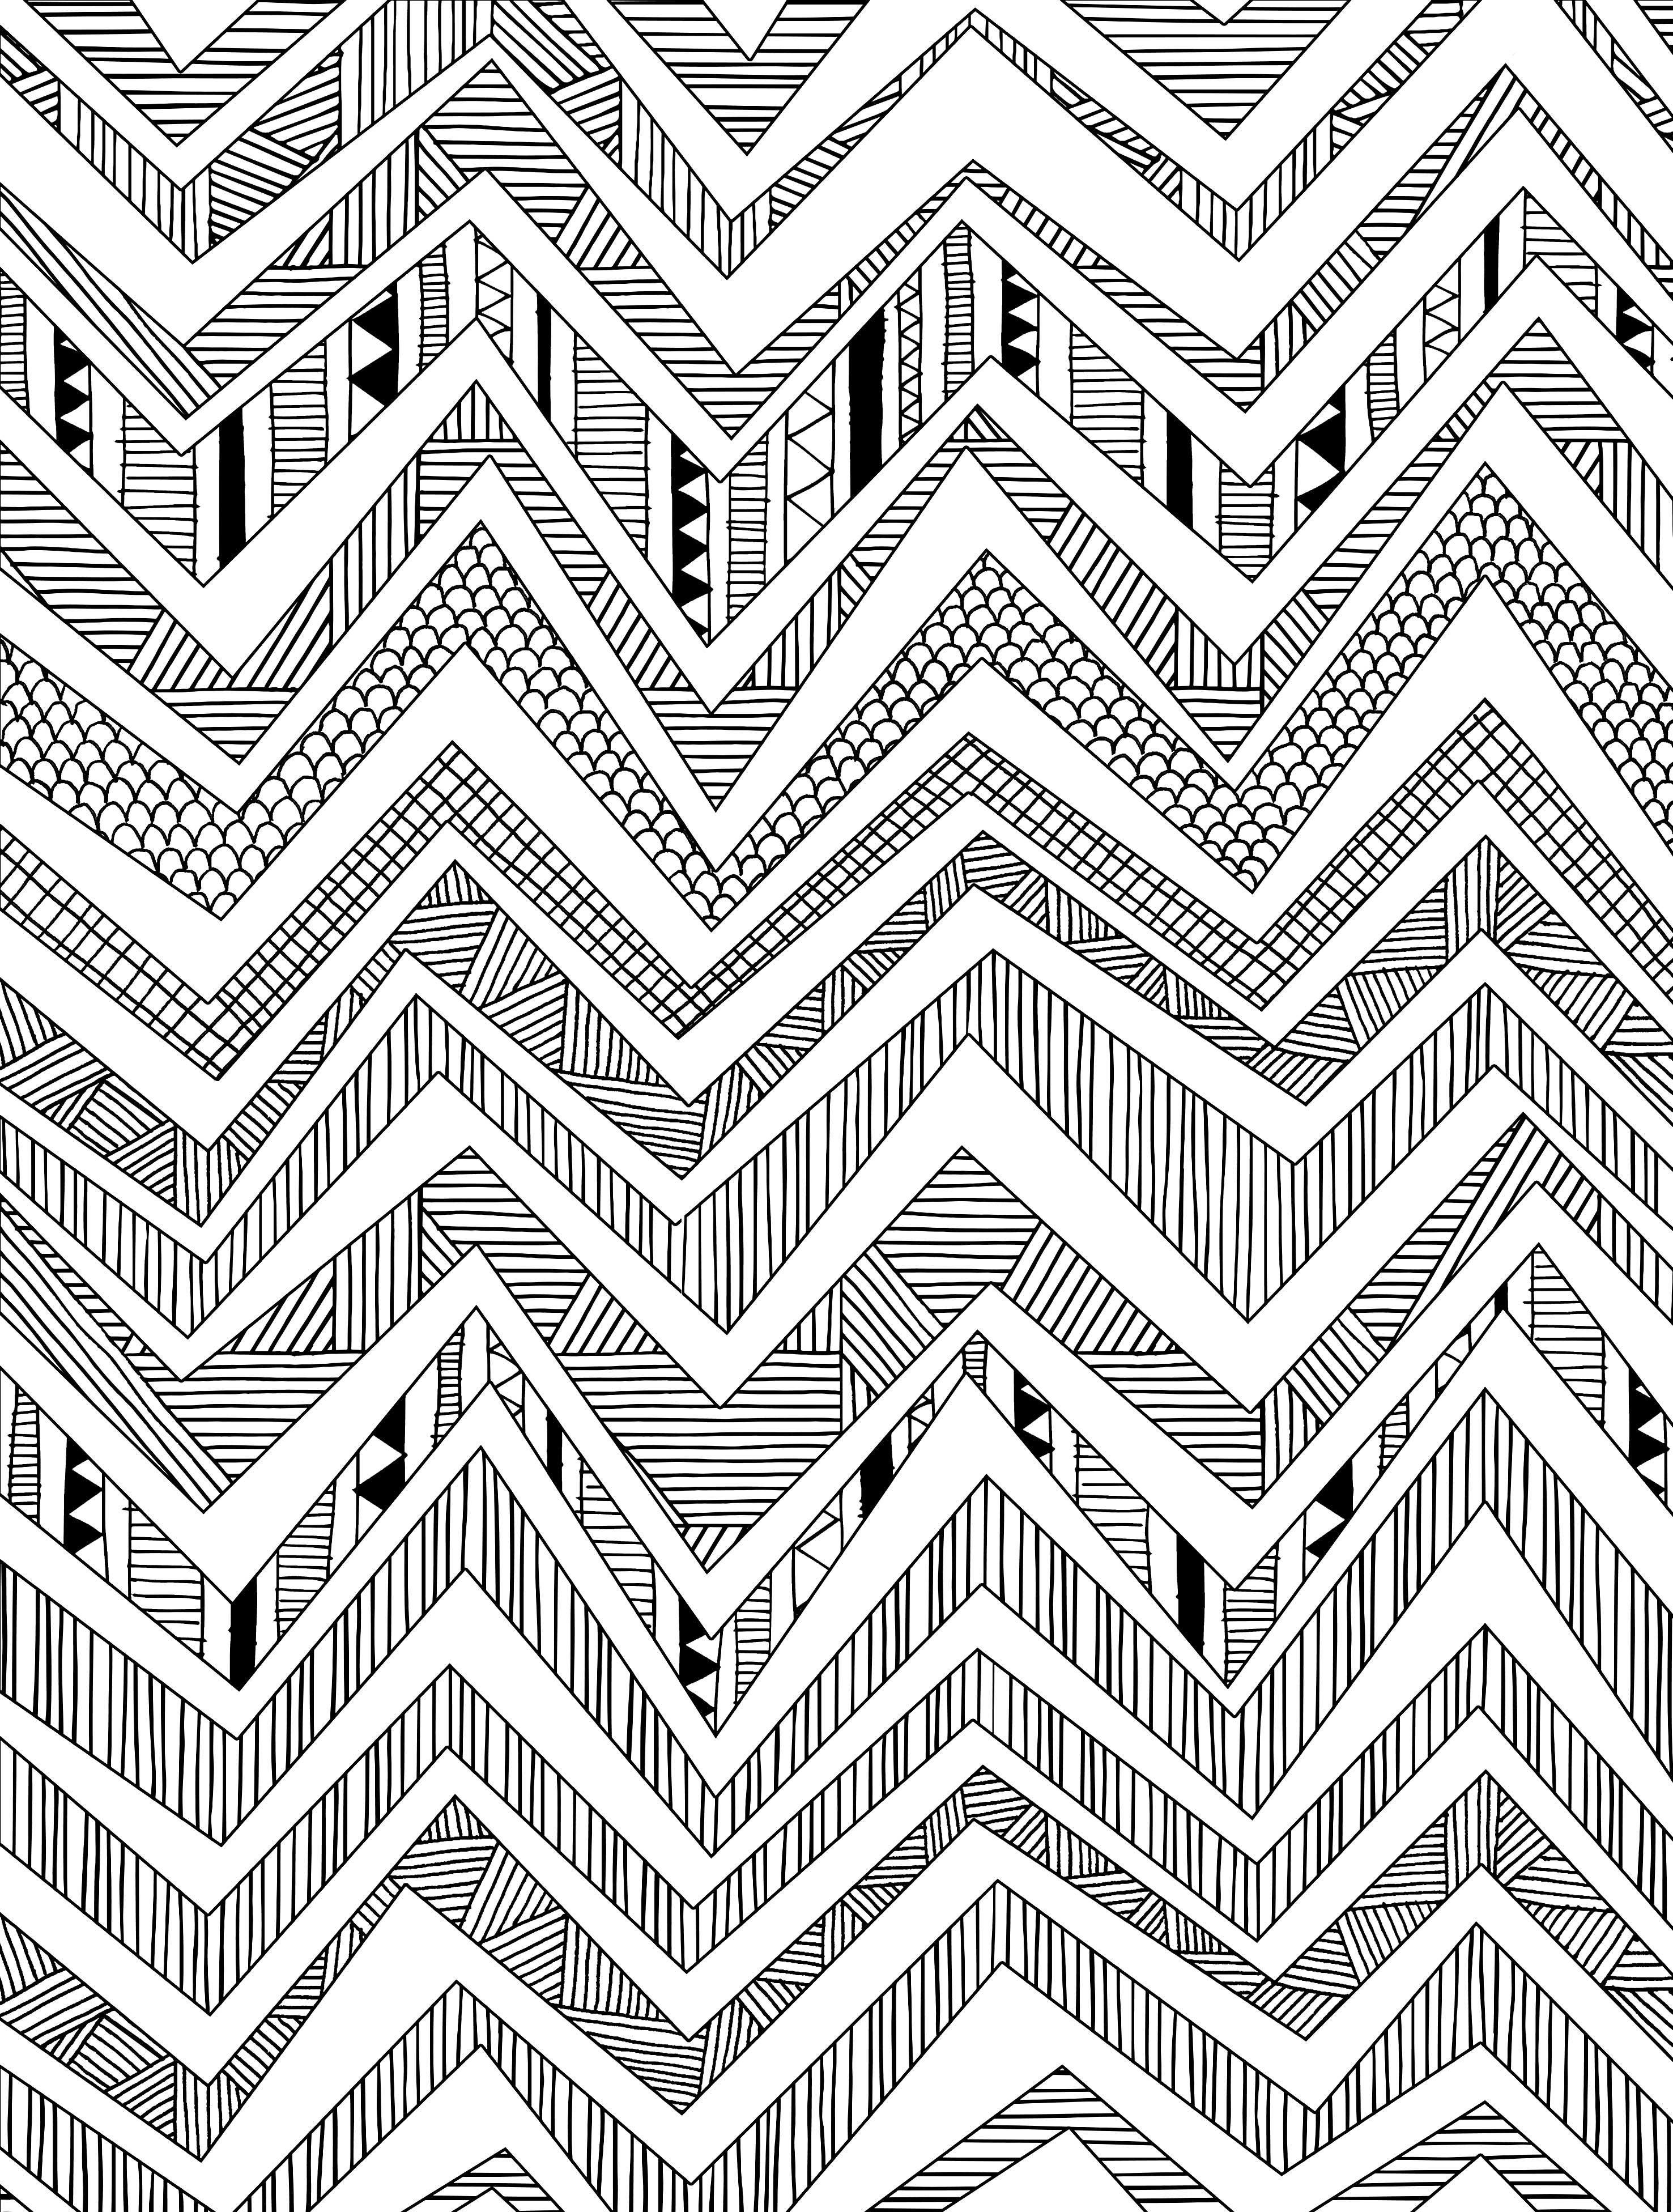 Geometricdesignbymolliemakescolouringbooksheetg